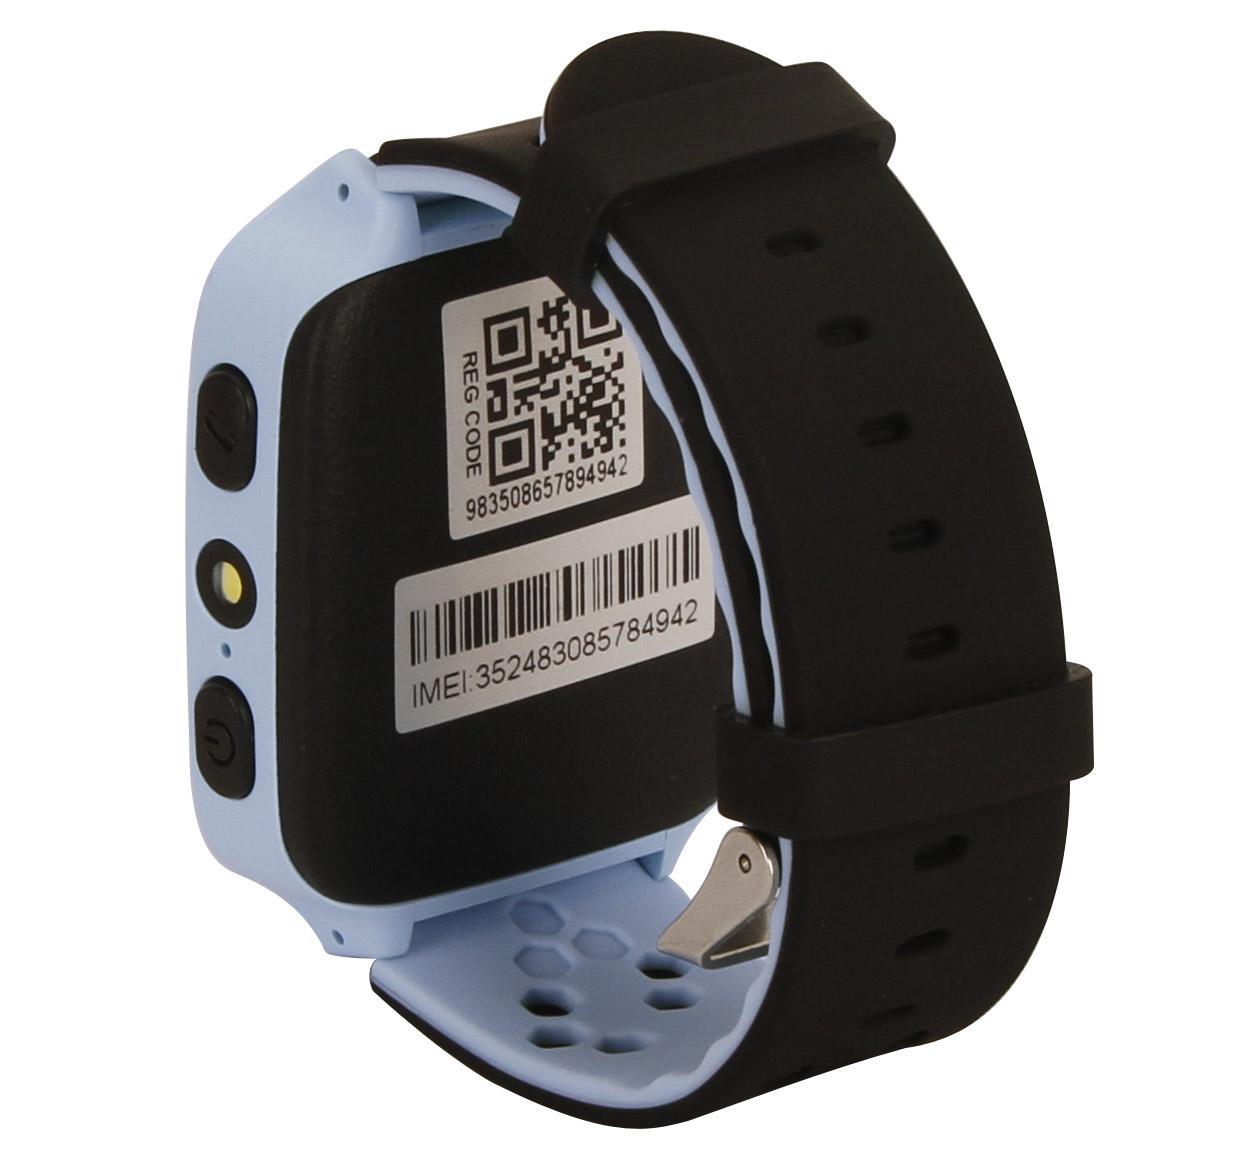 贝贝优可儿童智能GPS定位手表宝宝礼物W4 4